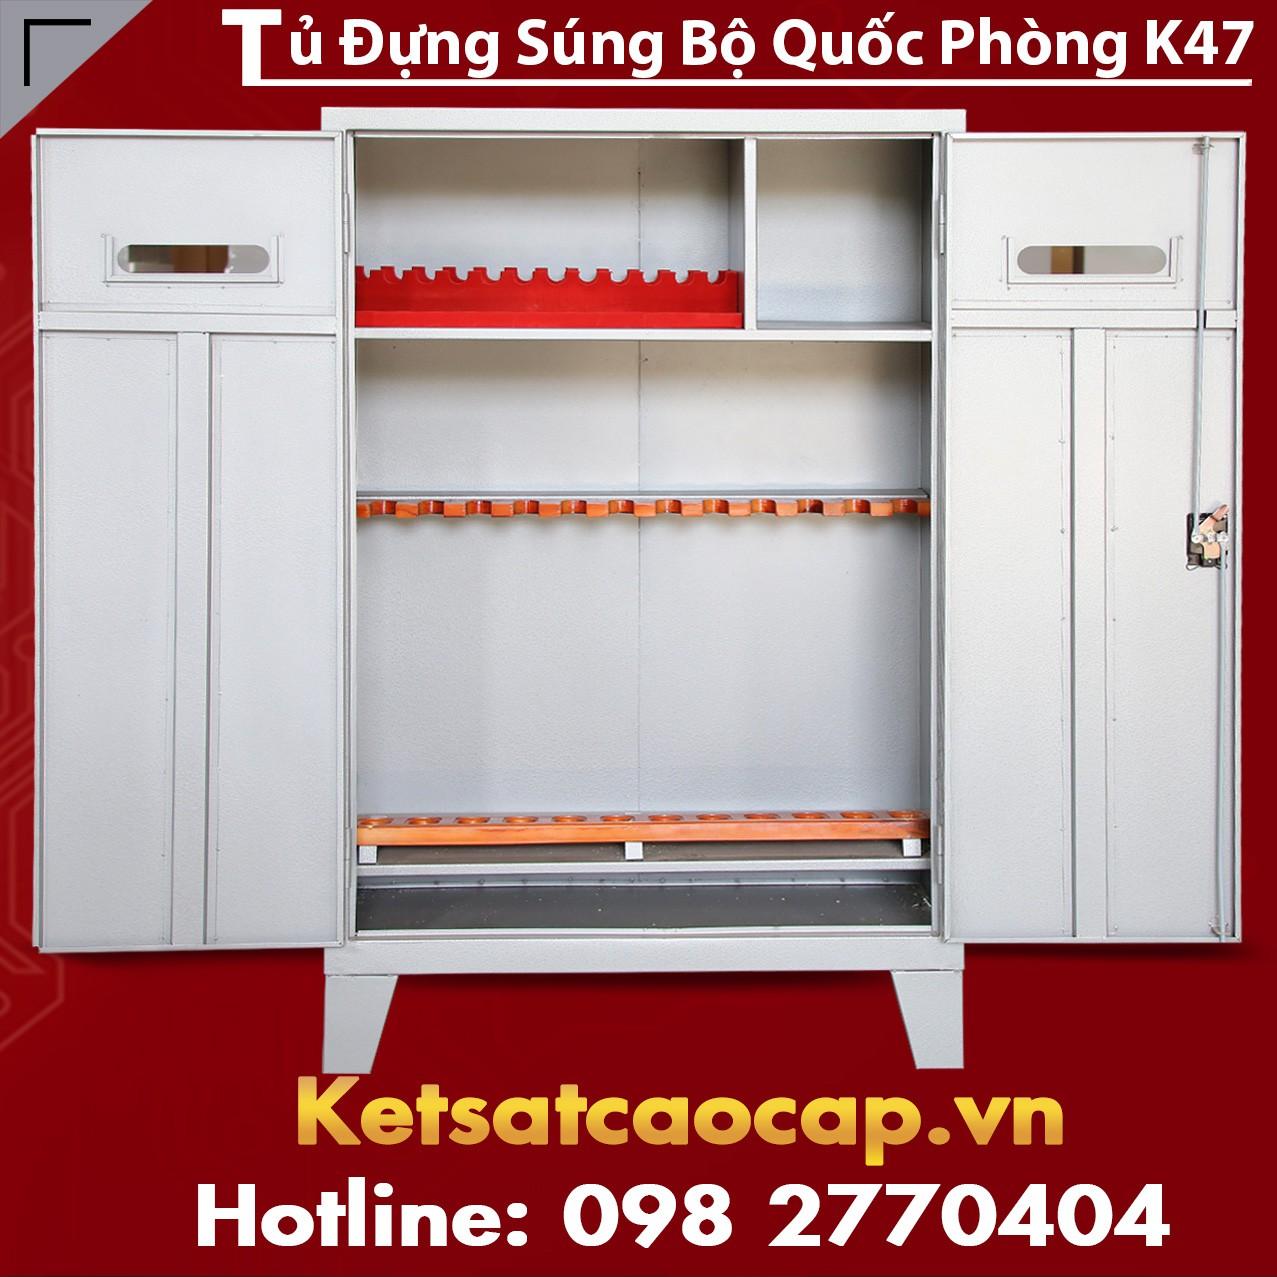 Tu Dung Sung Bo Cong An